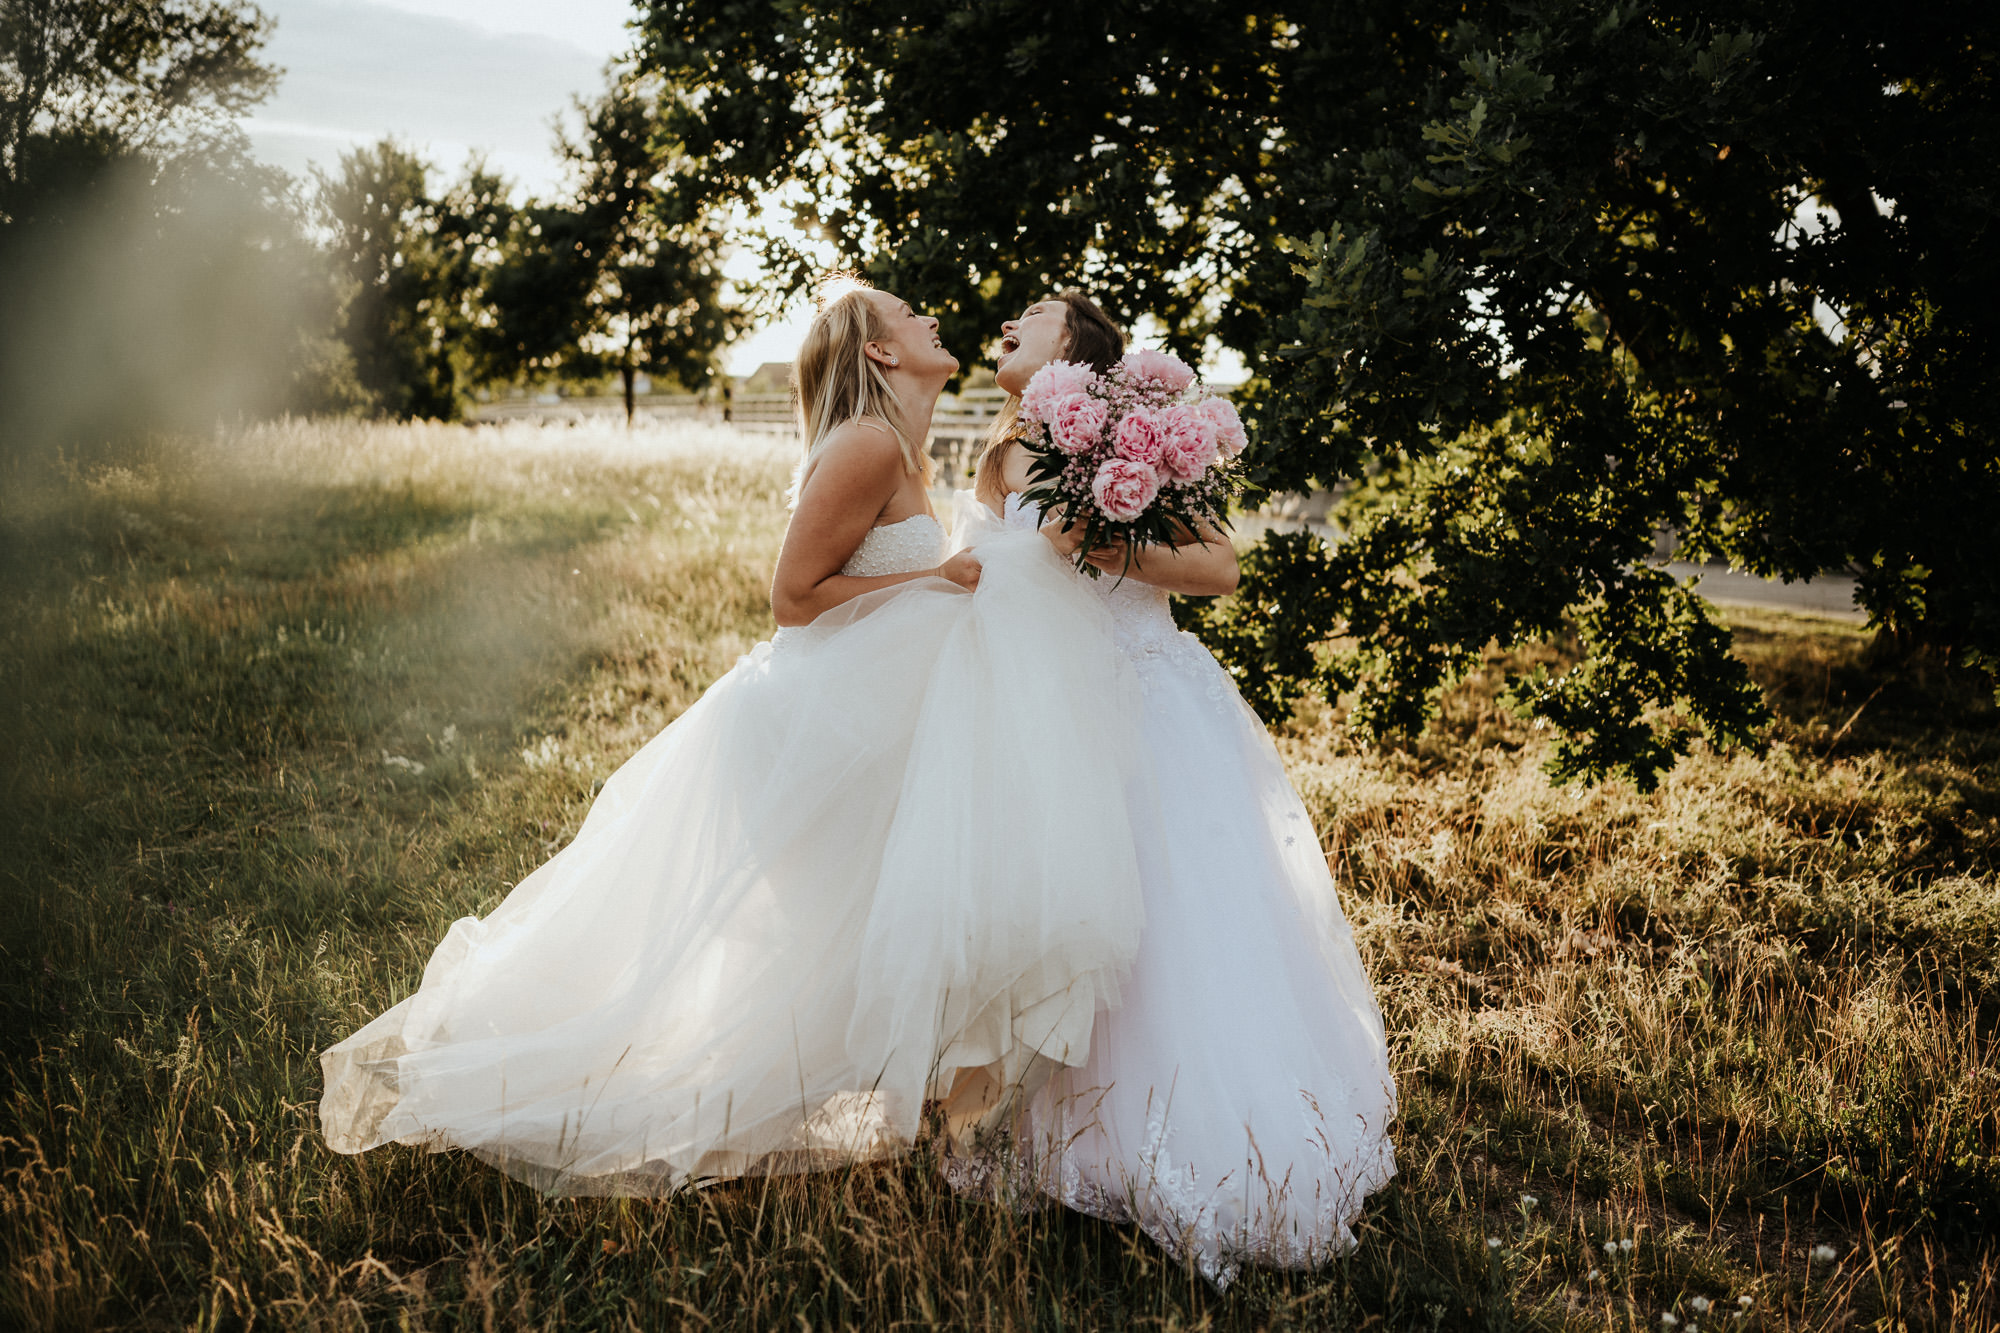 waltsmedia-hochzeitsreportage-after-wedding-shooting-berlin-6